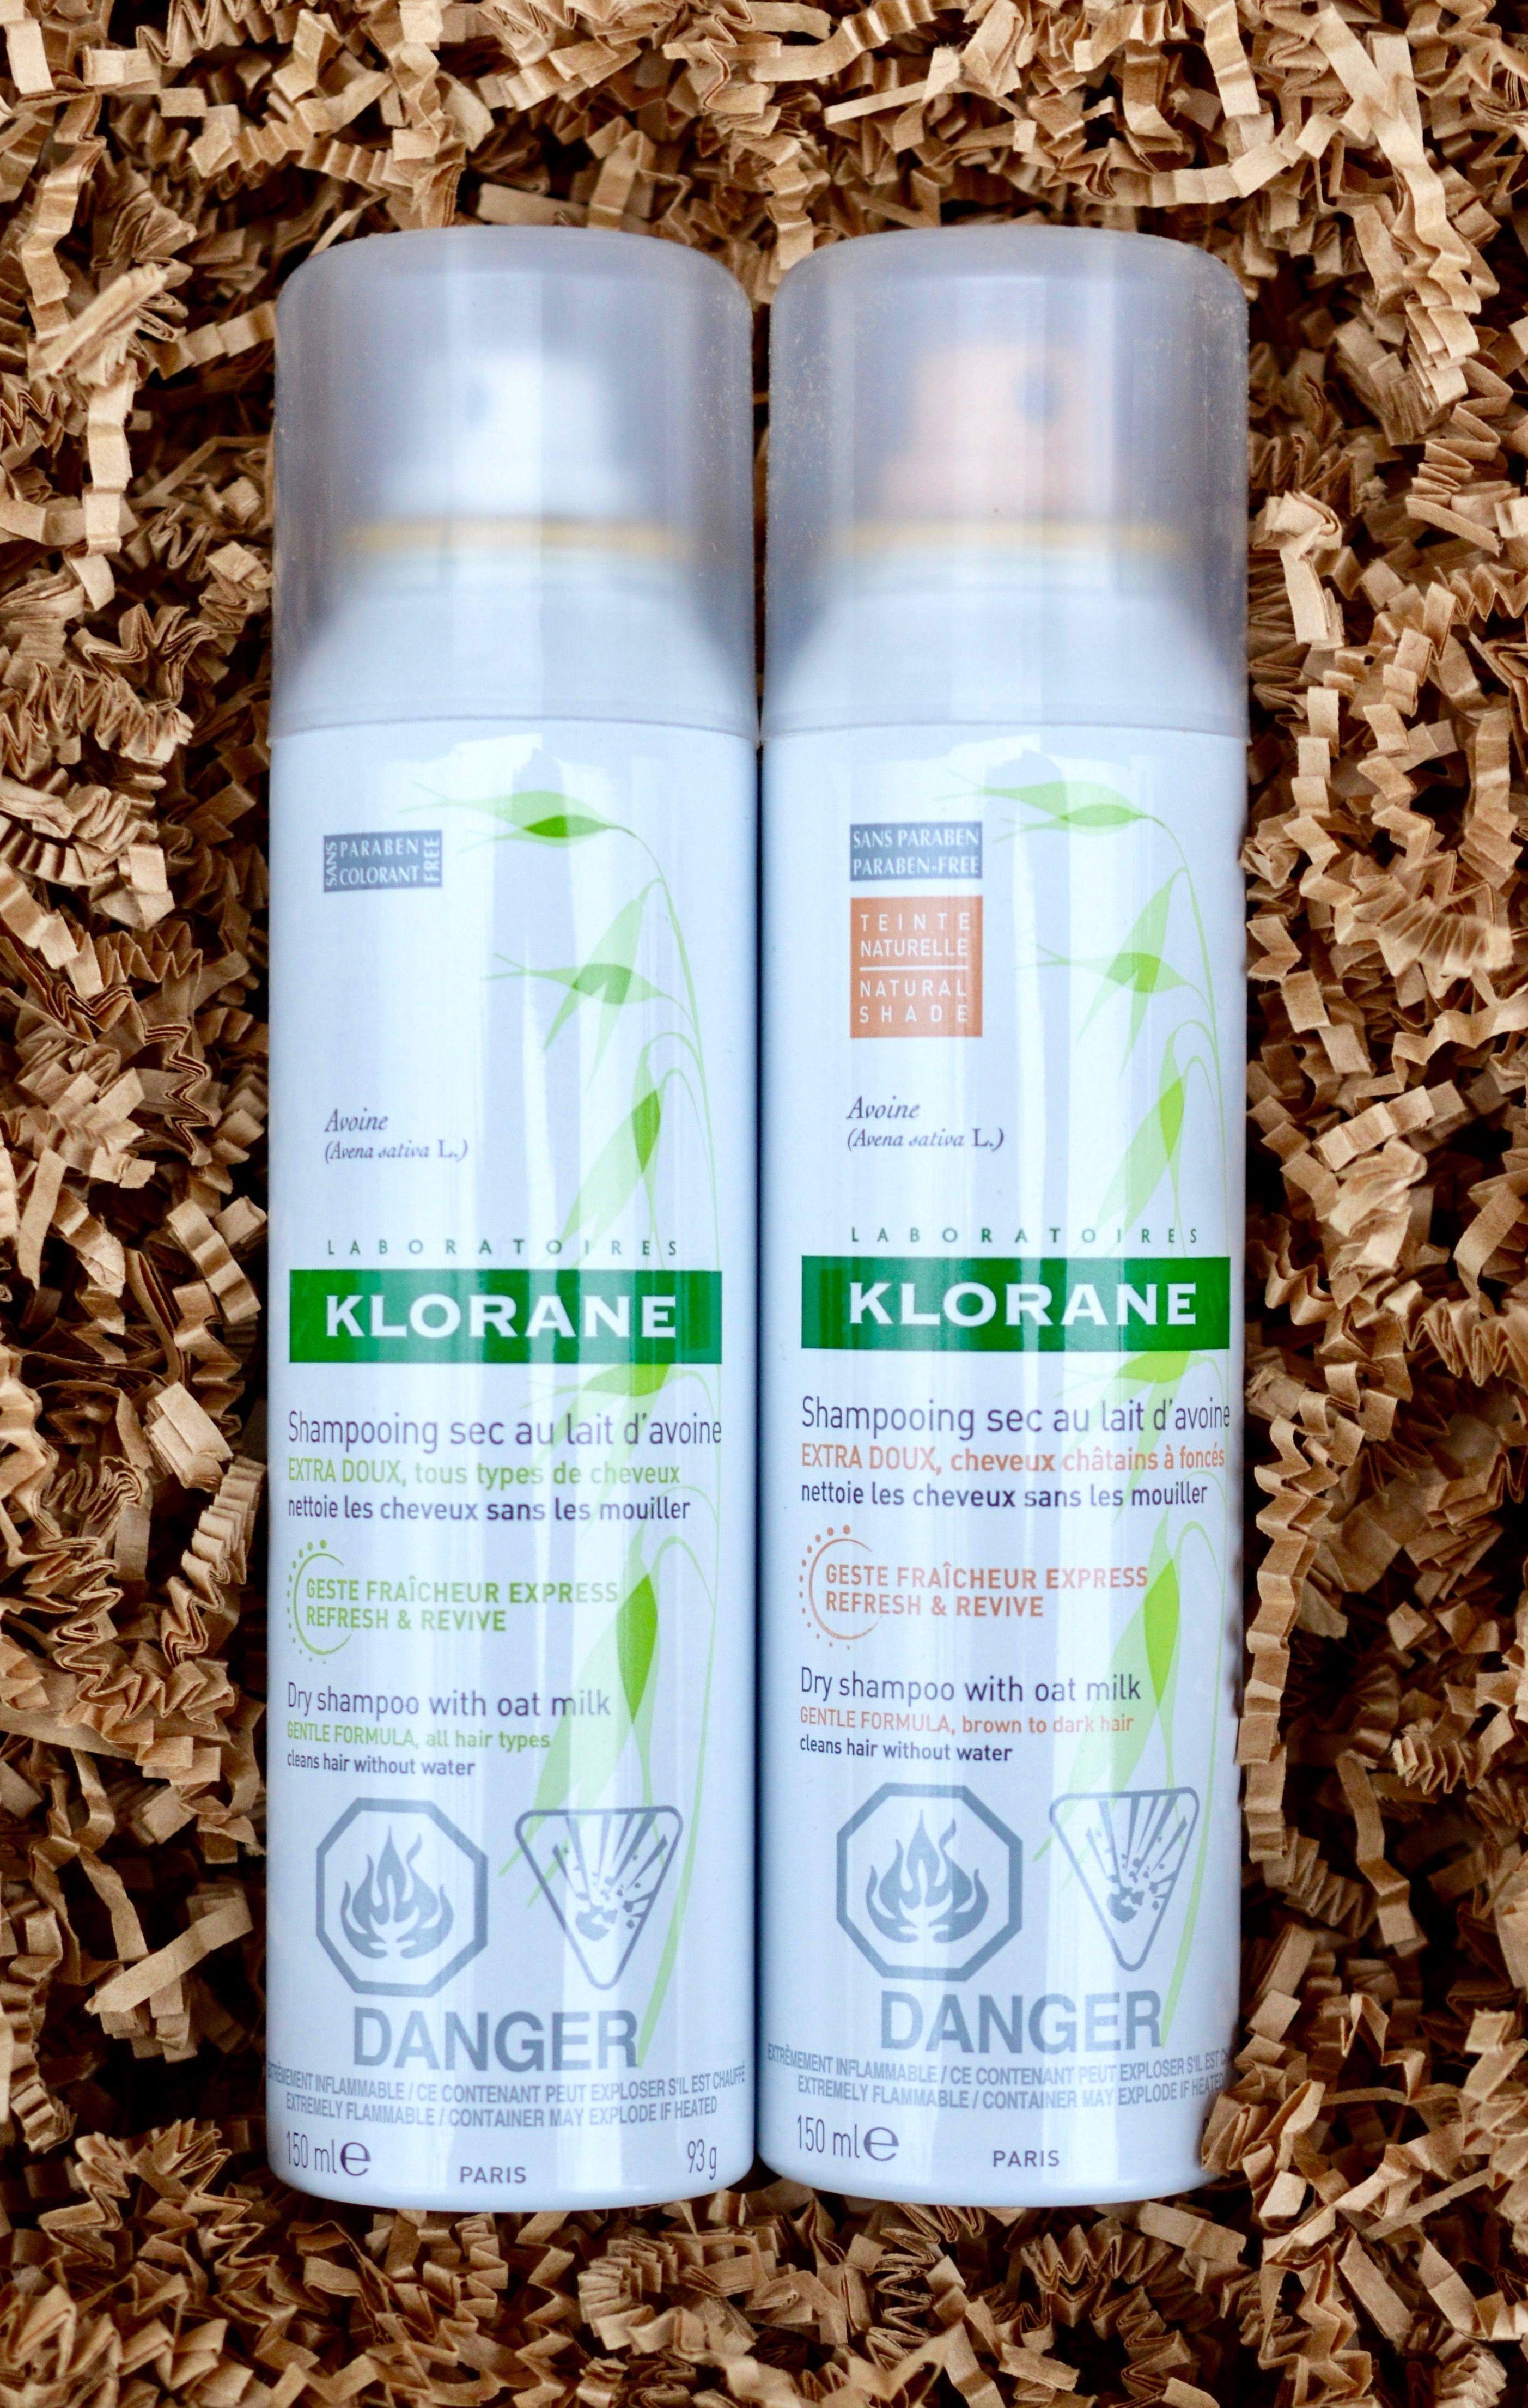 KloraneQuickFix Dry Shampoo (With images) Dry shampoo